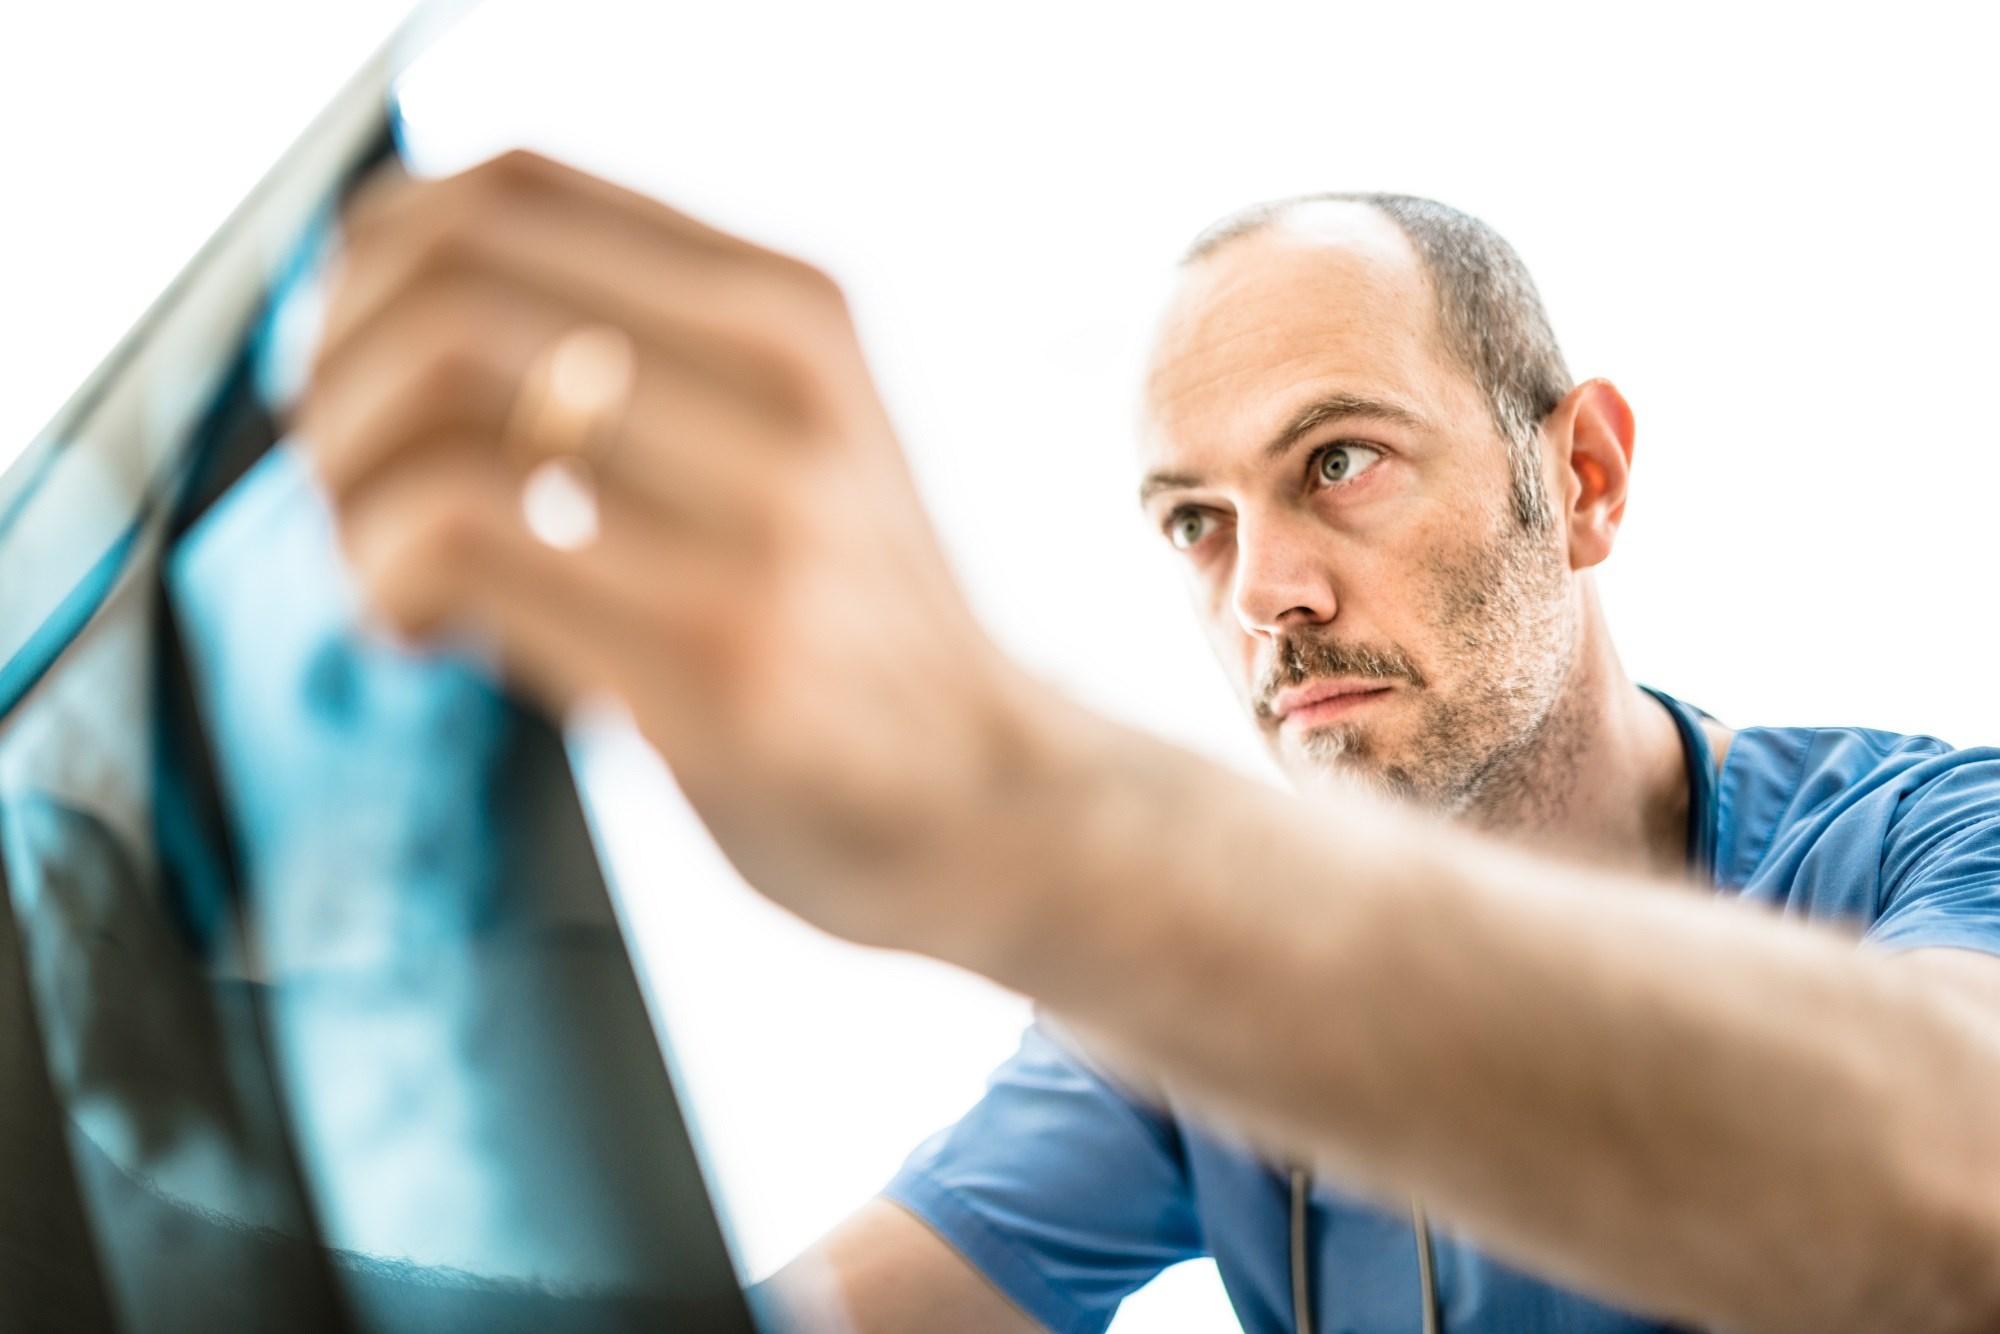 Vertebral Fracture Assessment Imaging May Predict Incident Fractures